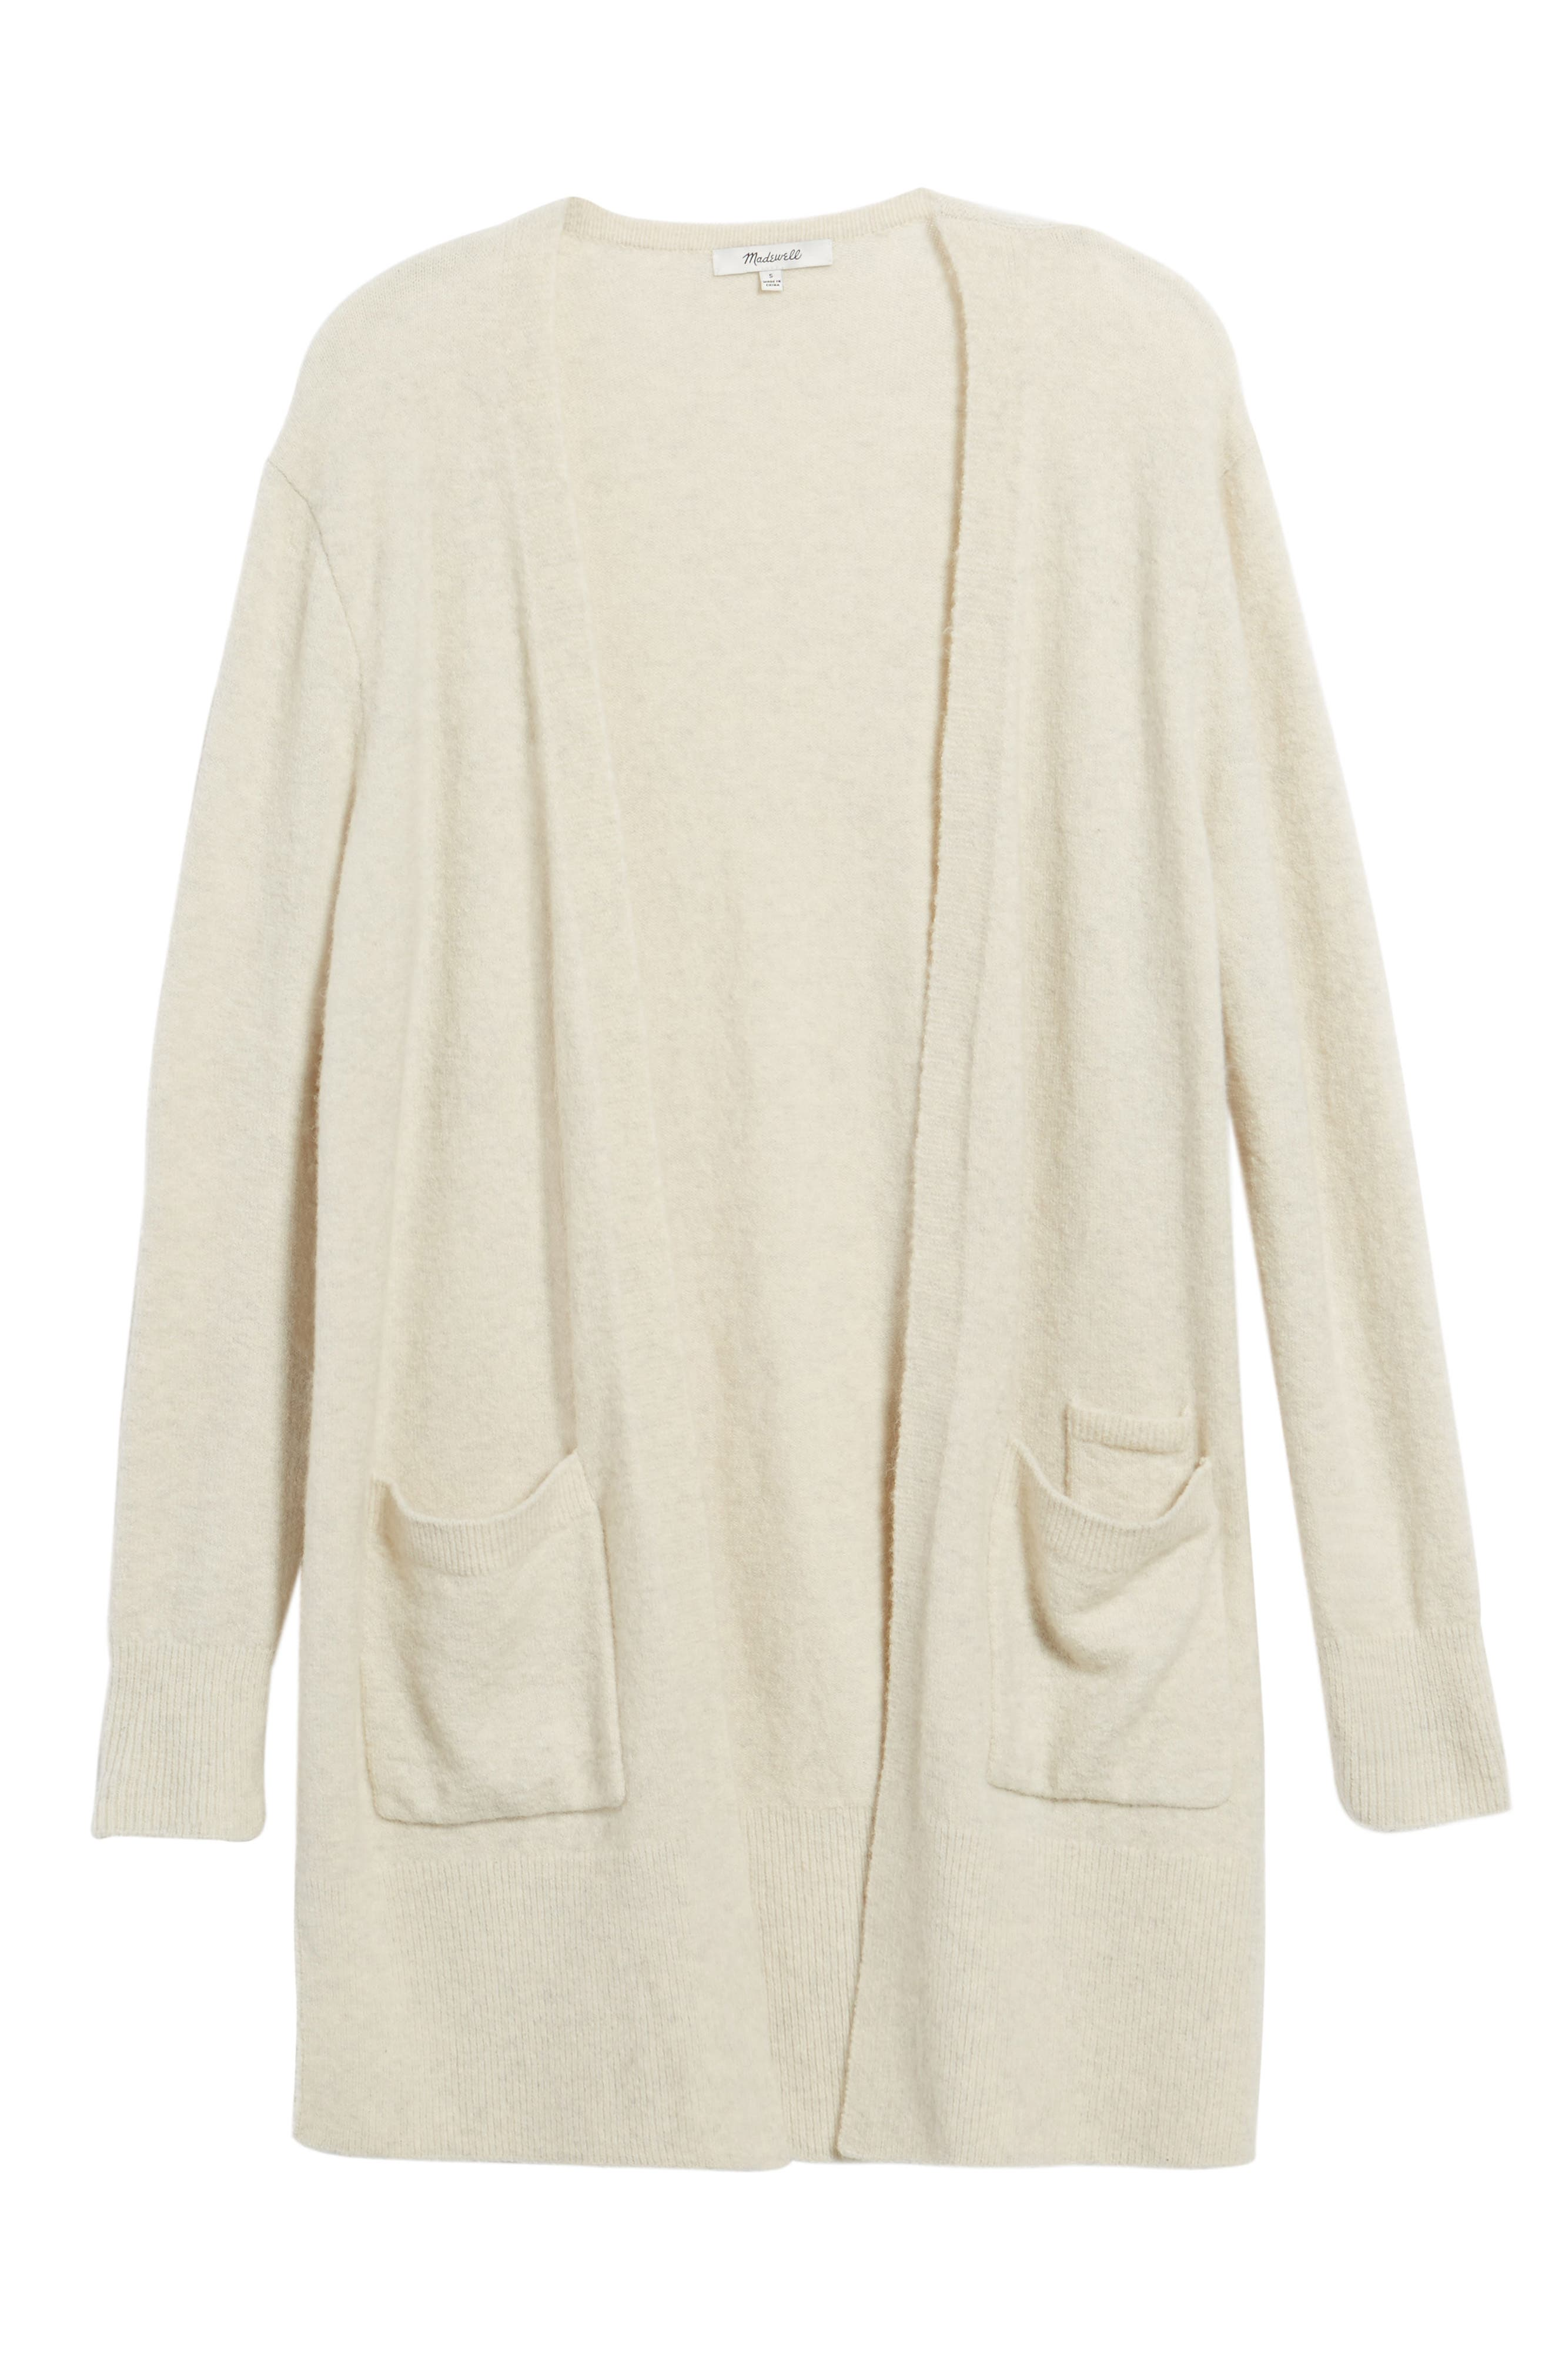 Main Image - Madewell Kent Cardigan Sweater